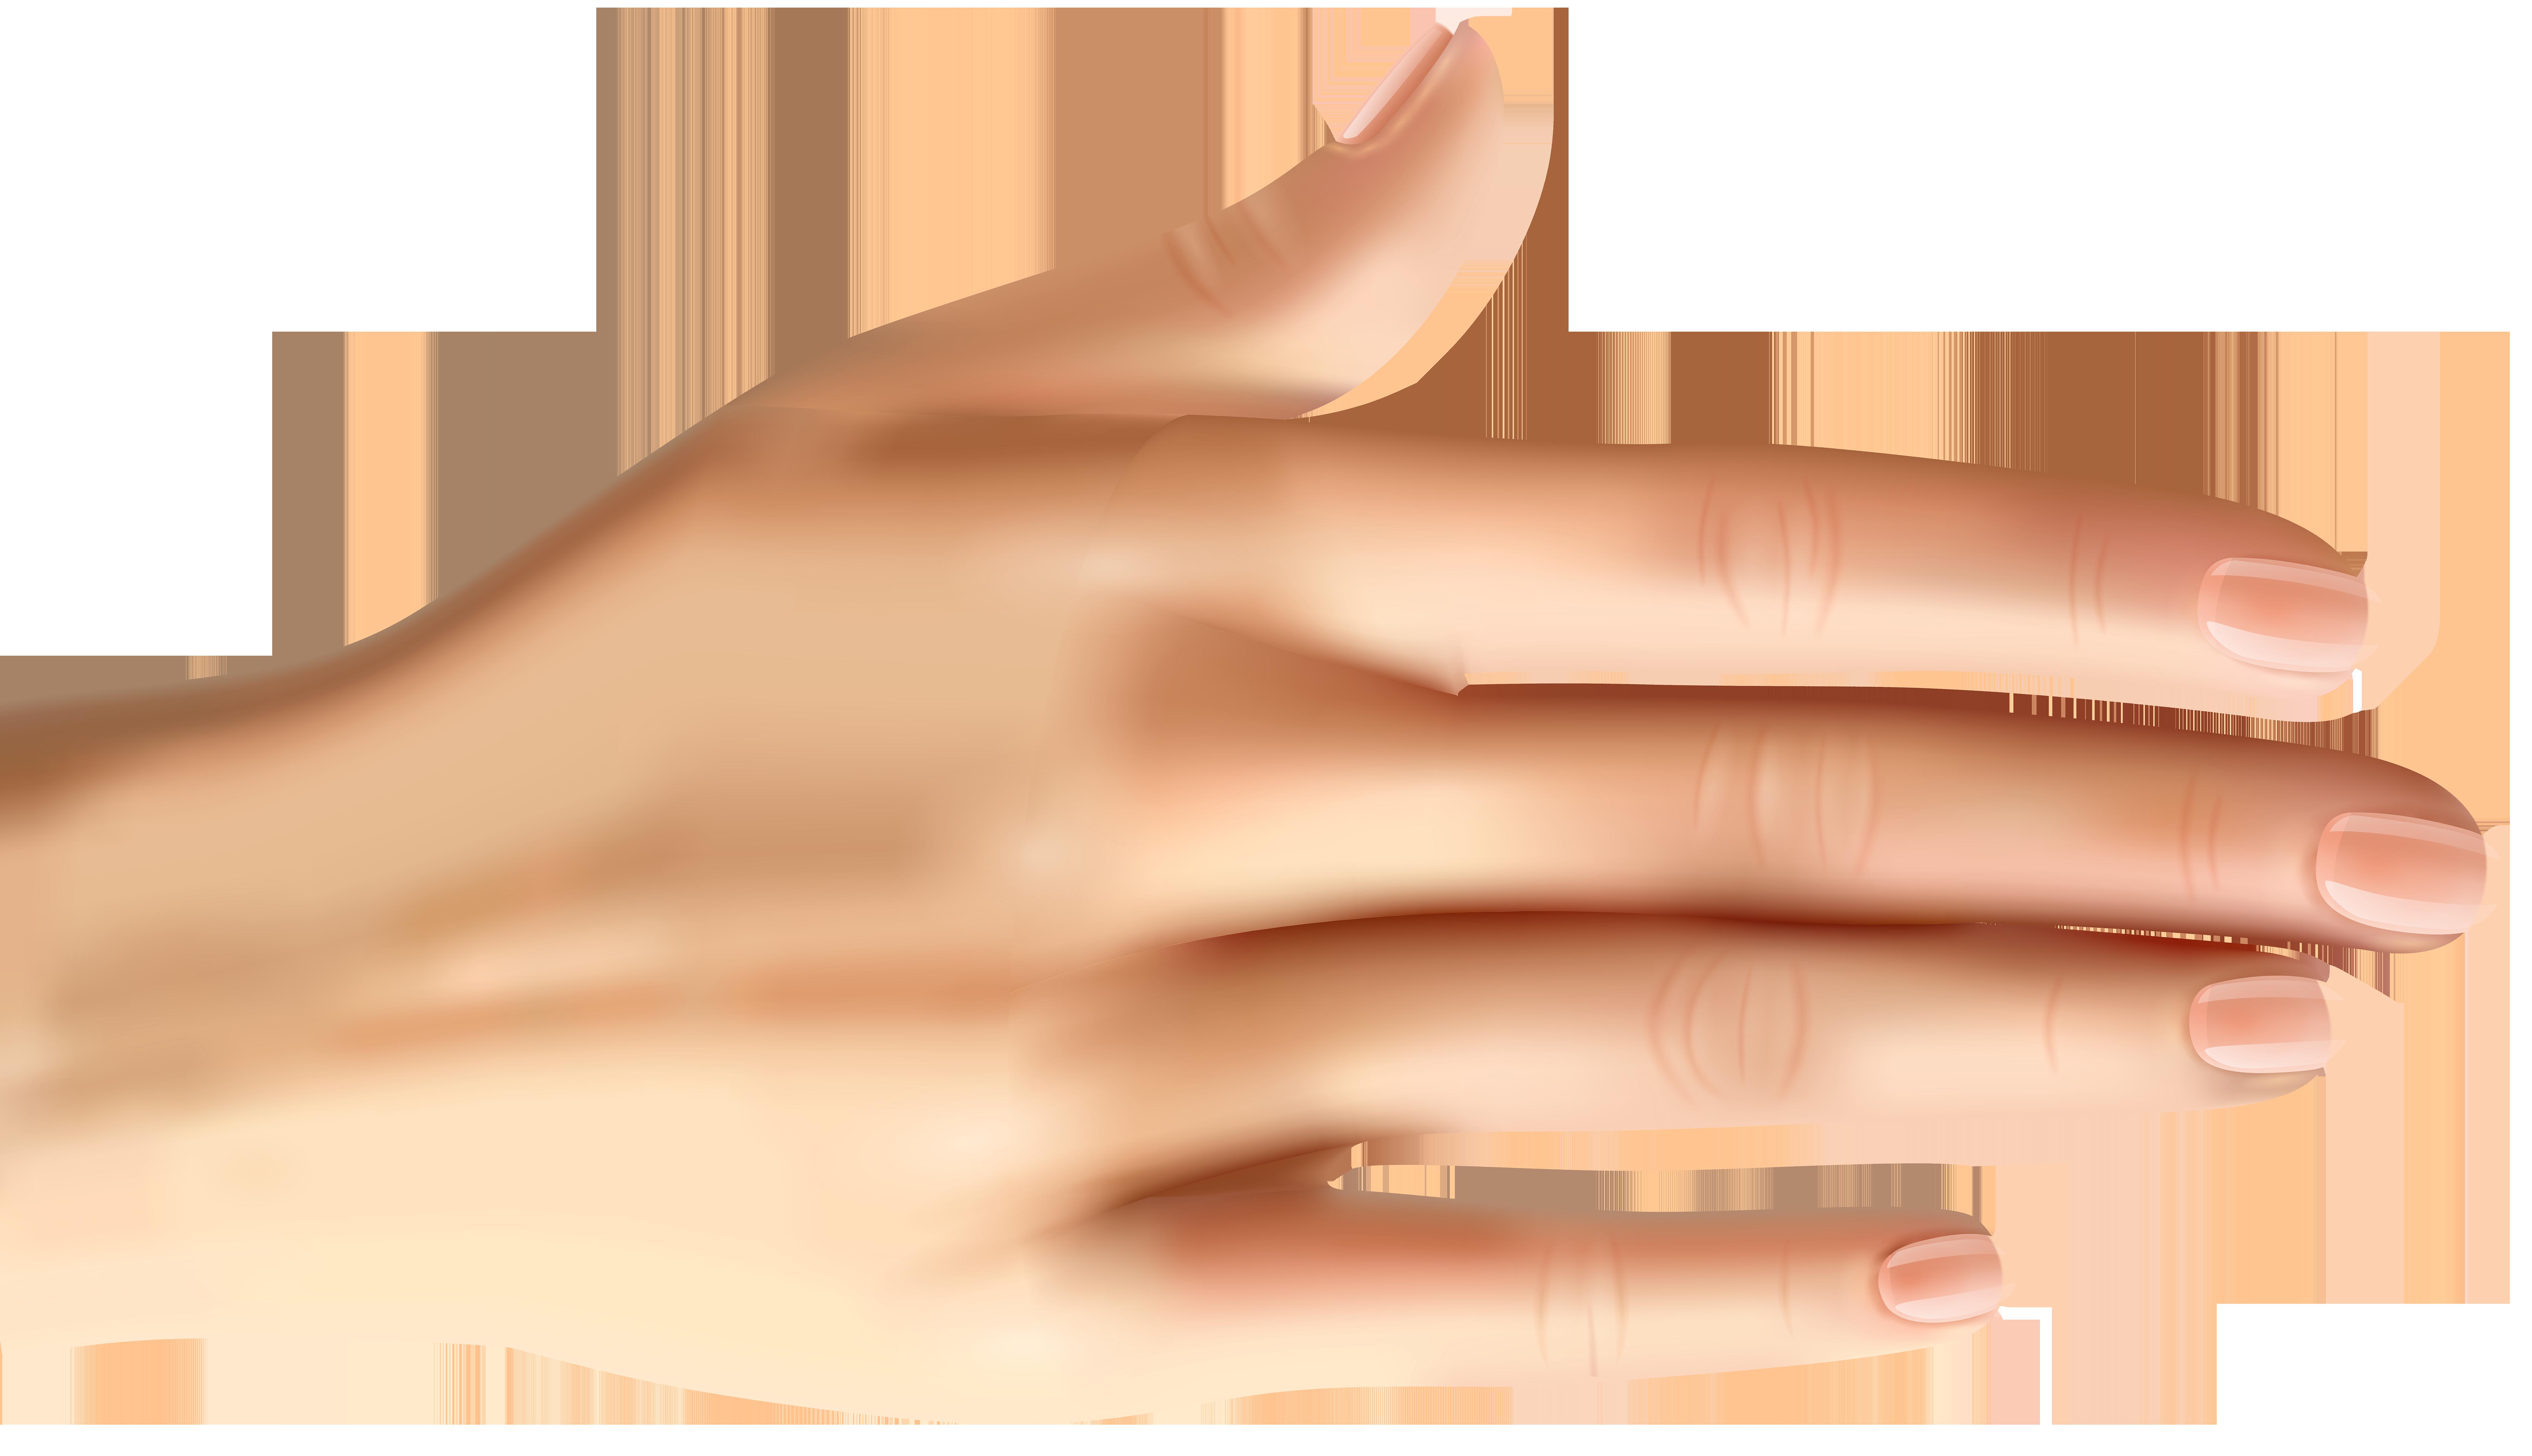 Finger clipart finger nail. Hand model manicure thumb